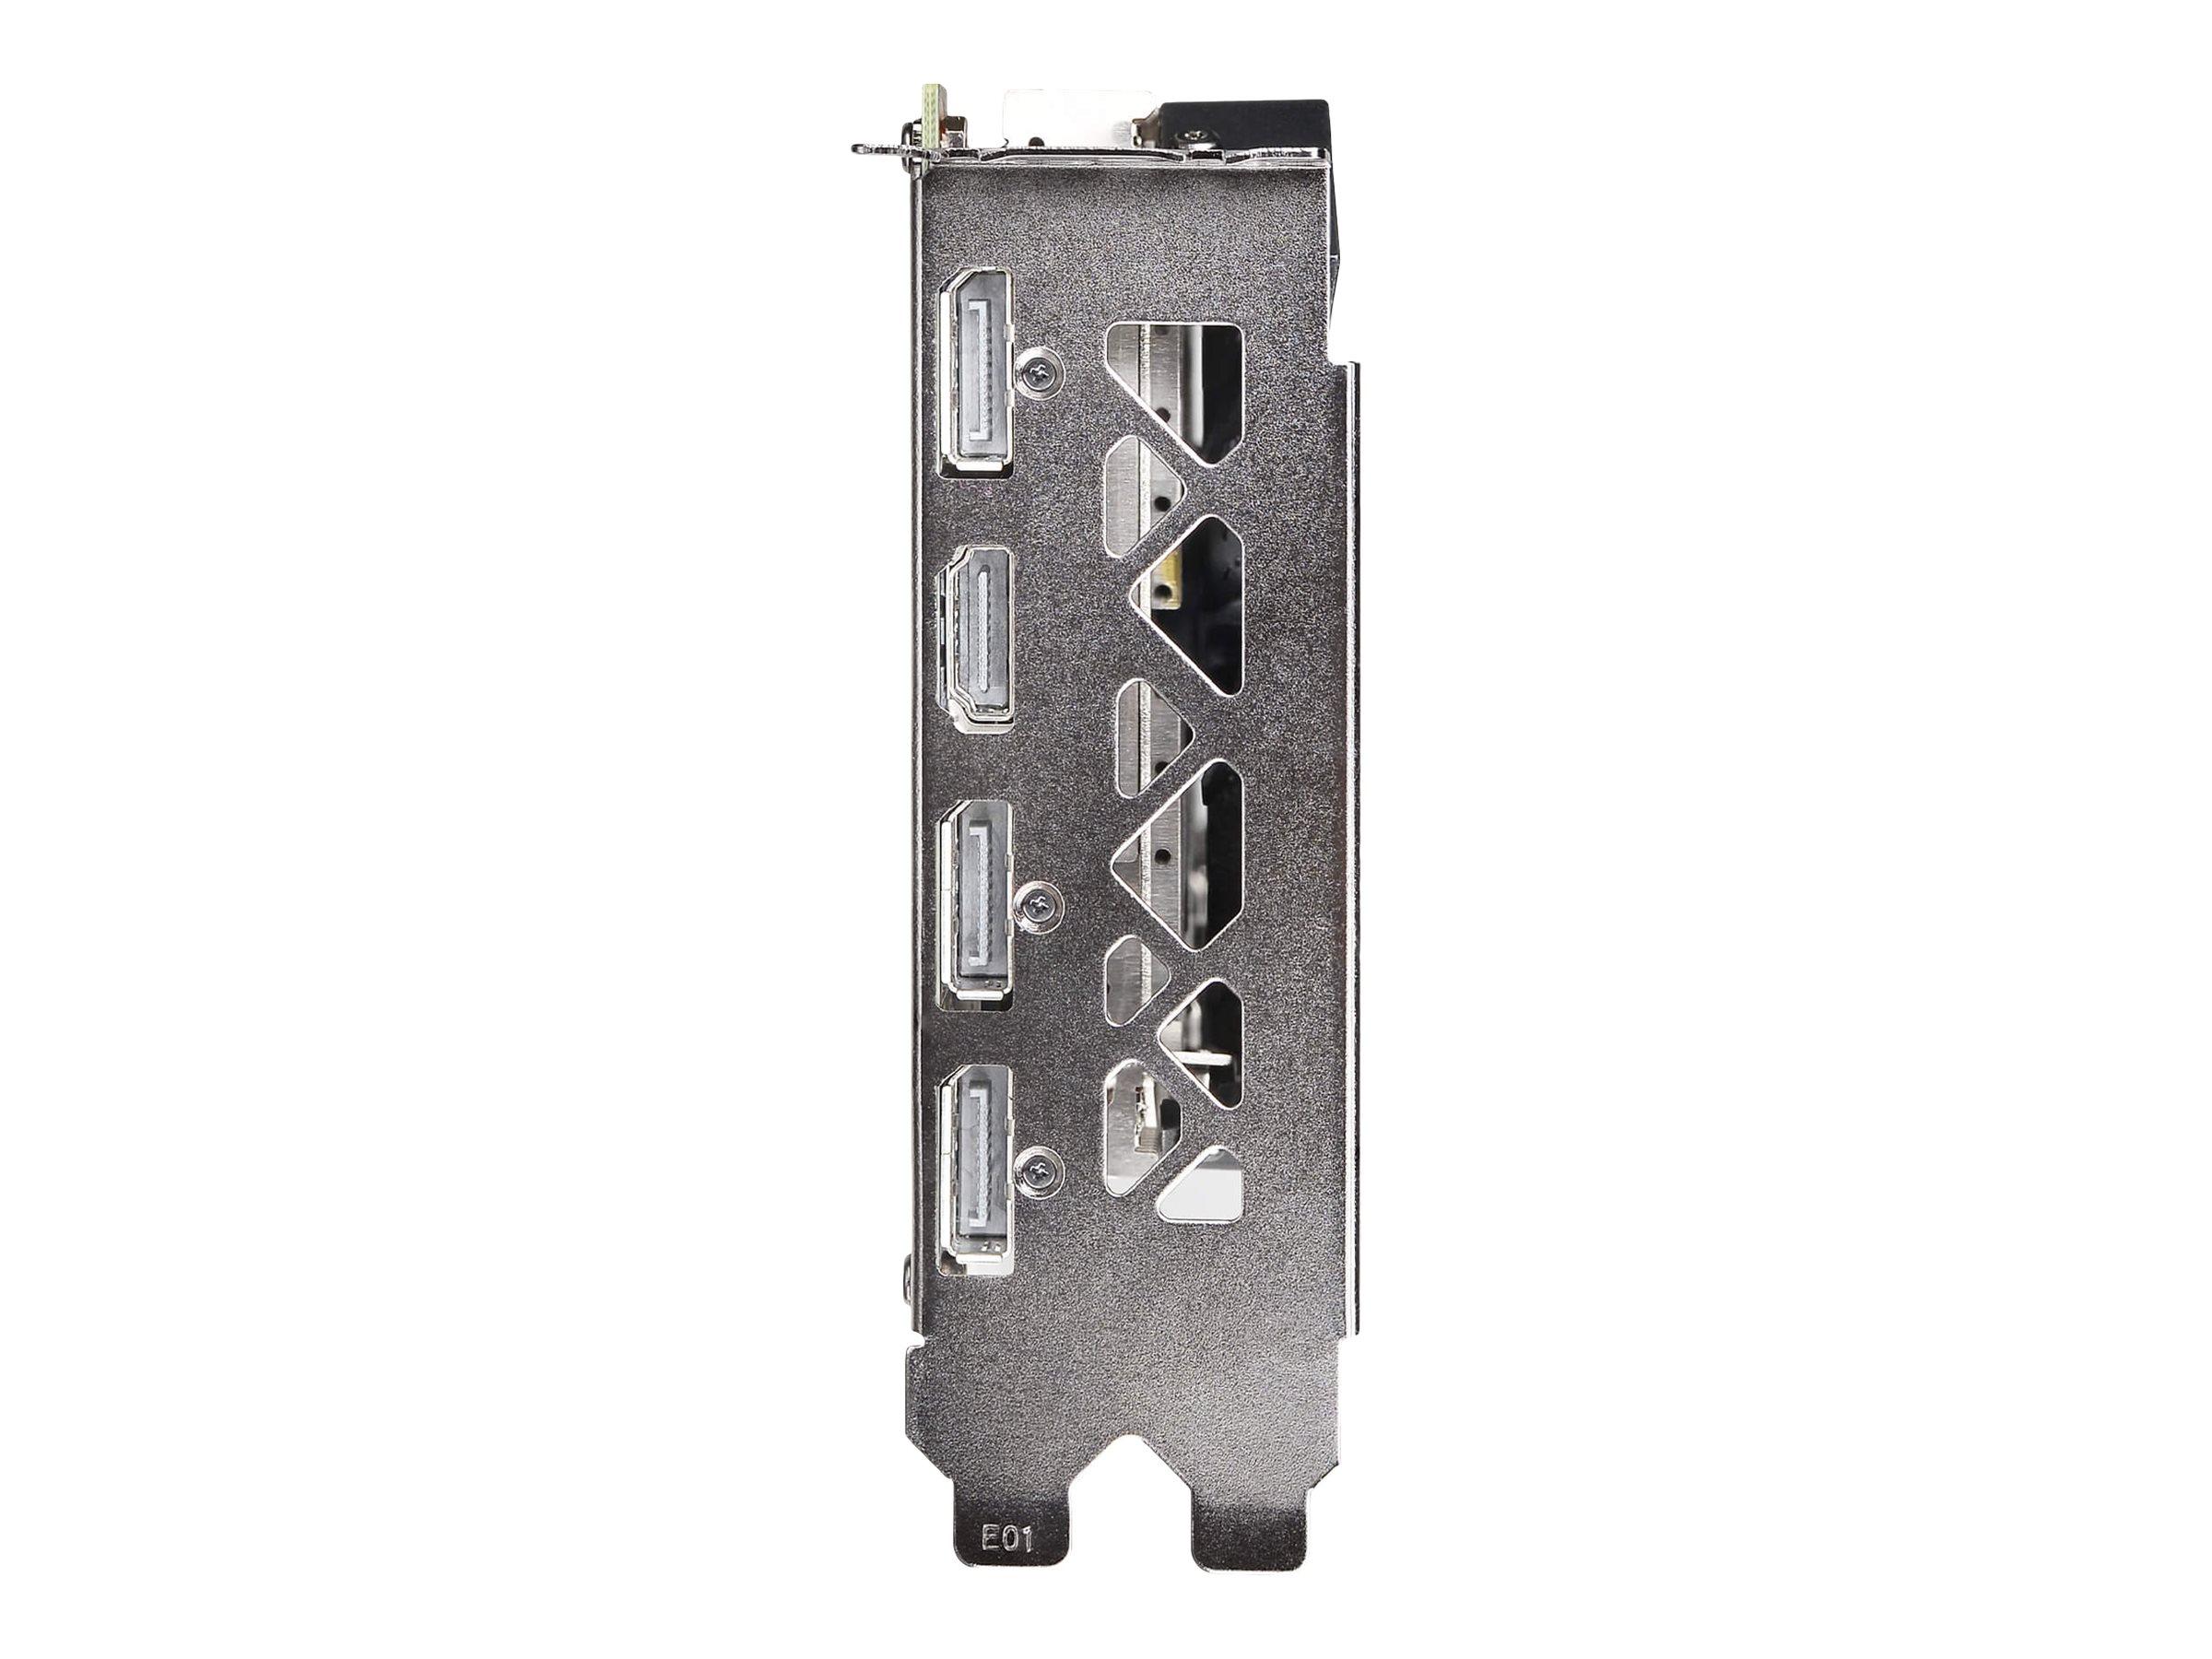 EVGA GeForce RTX 2070 SUPER KO GAMING - Grafikkarten